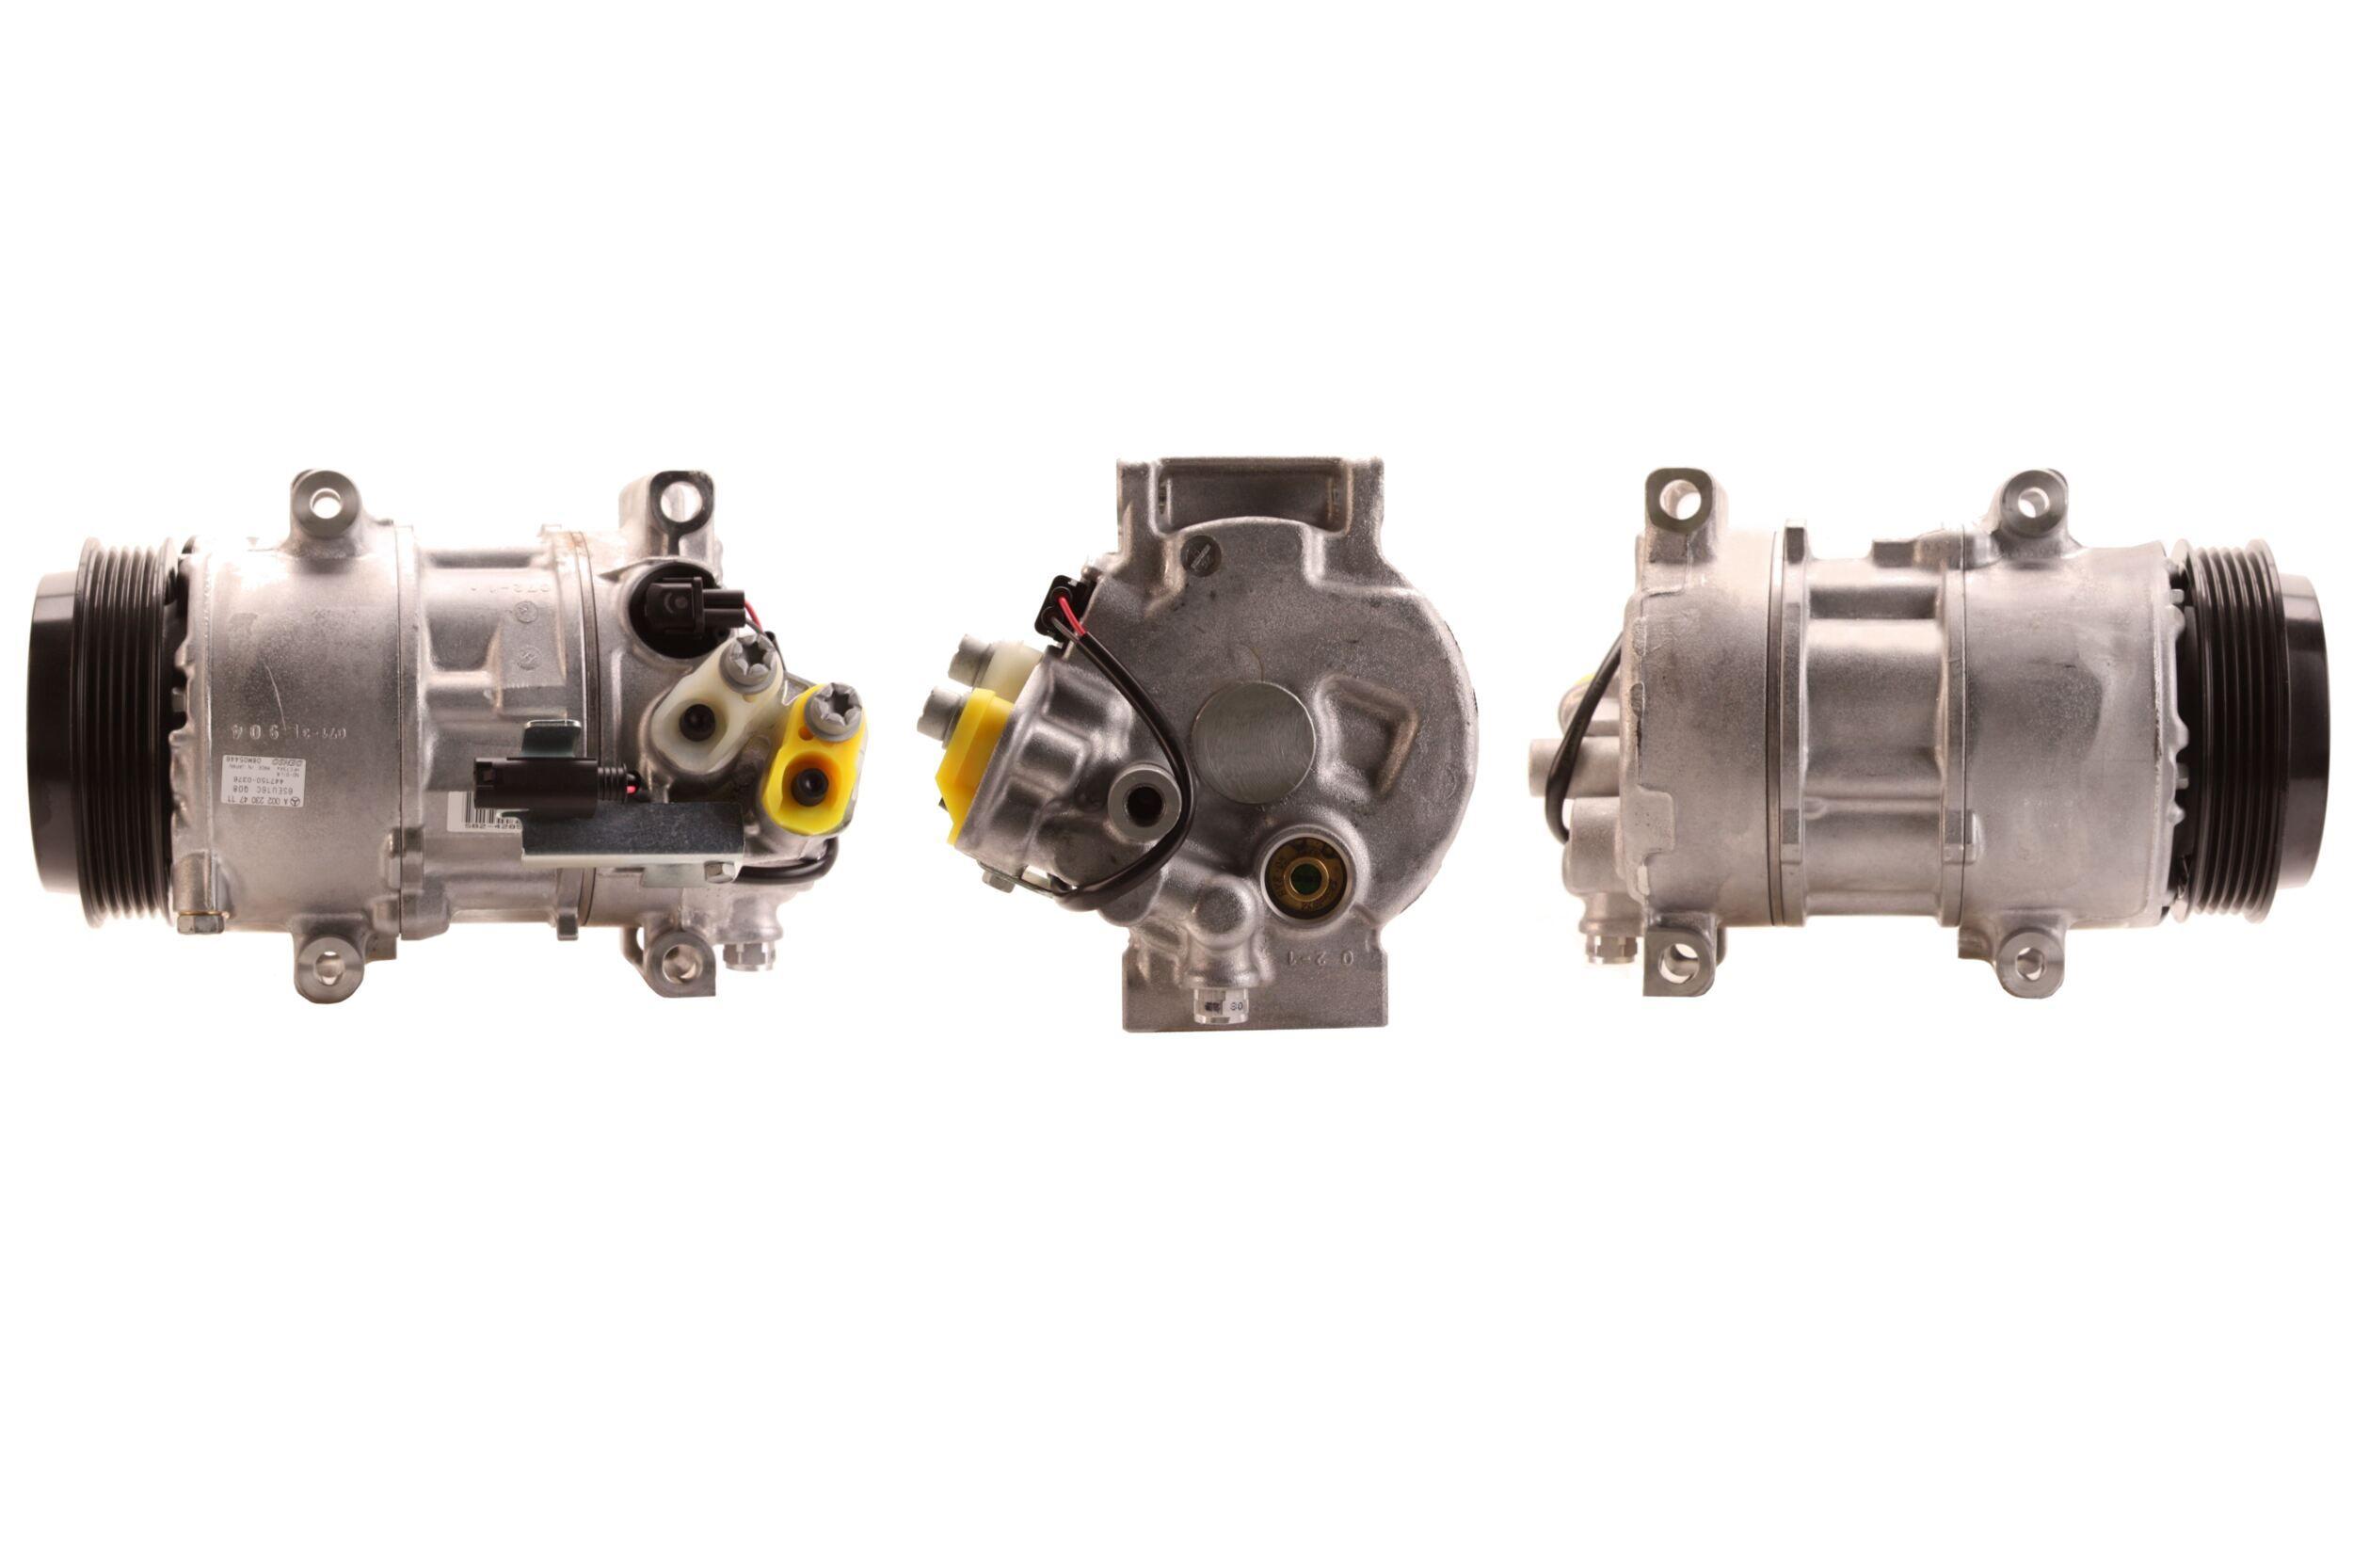 Kompressor ELSTOCK 51-0648